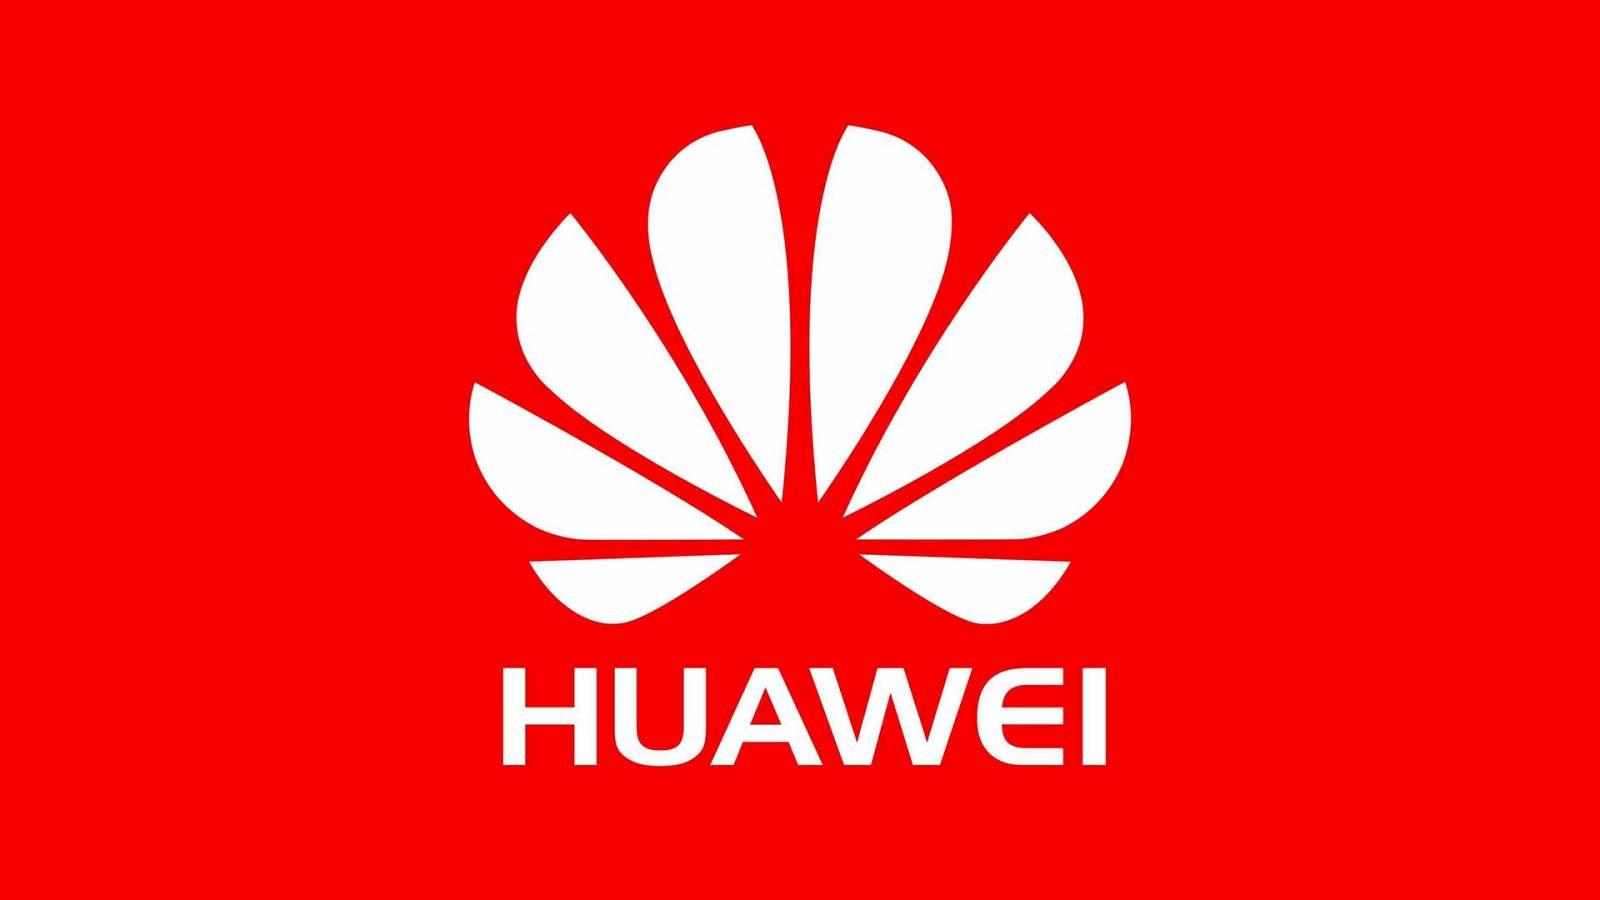 Huawei holografic